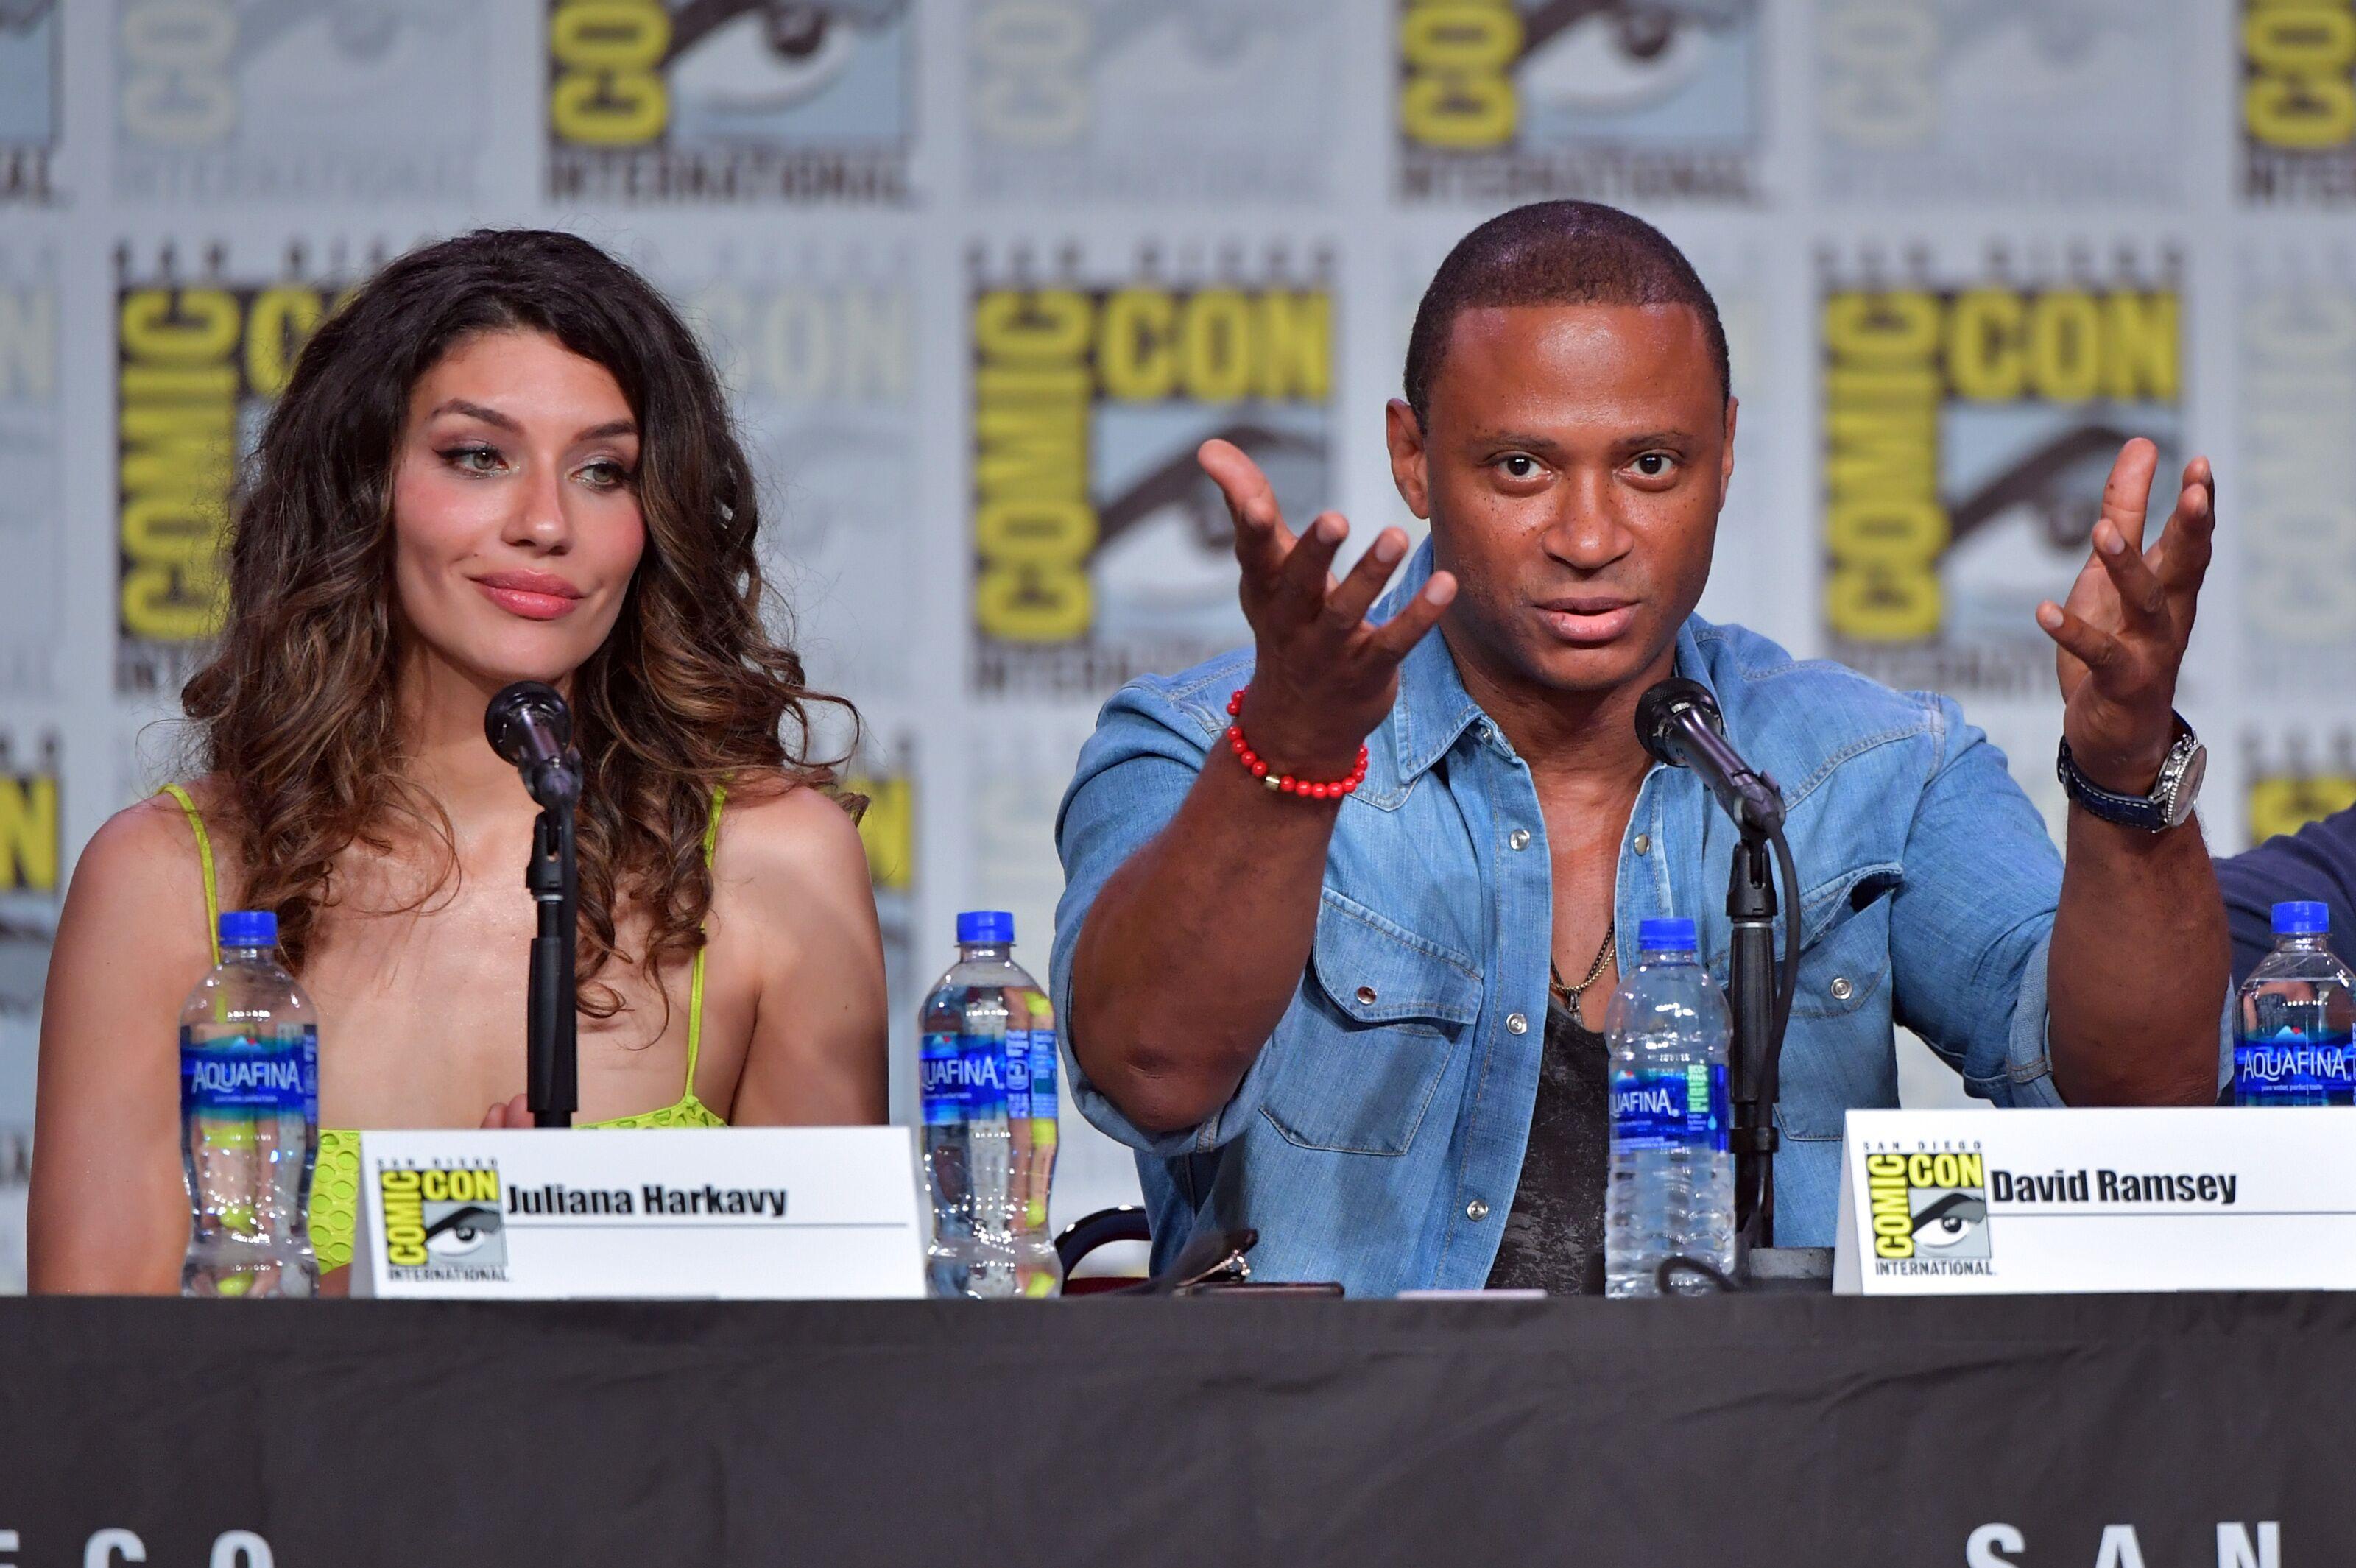 Arrow Season 8: David Ramsey promises answers to unresolved